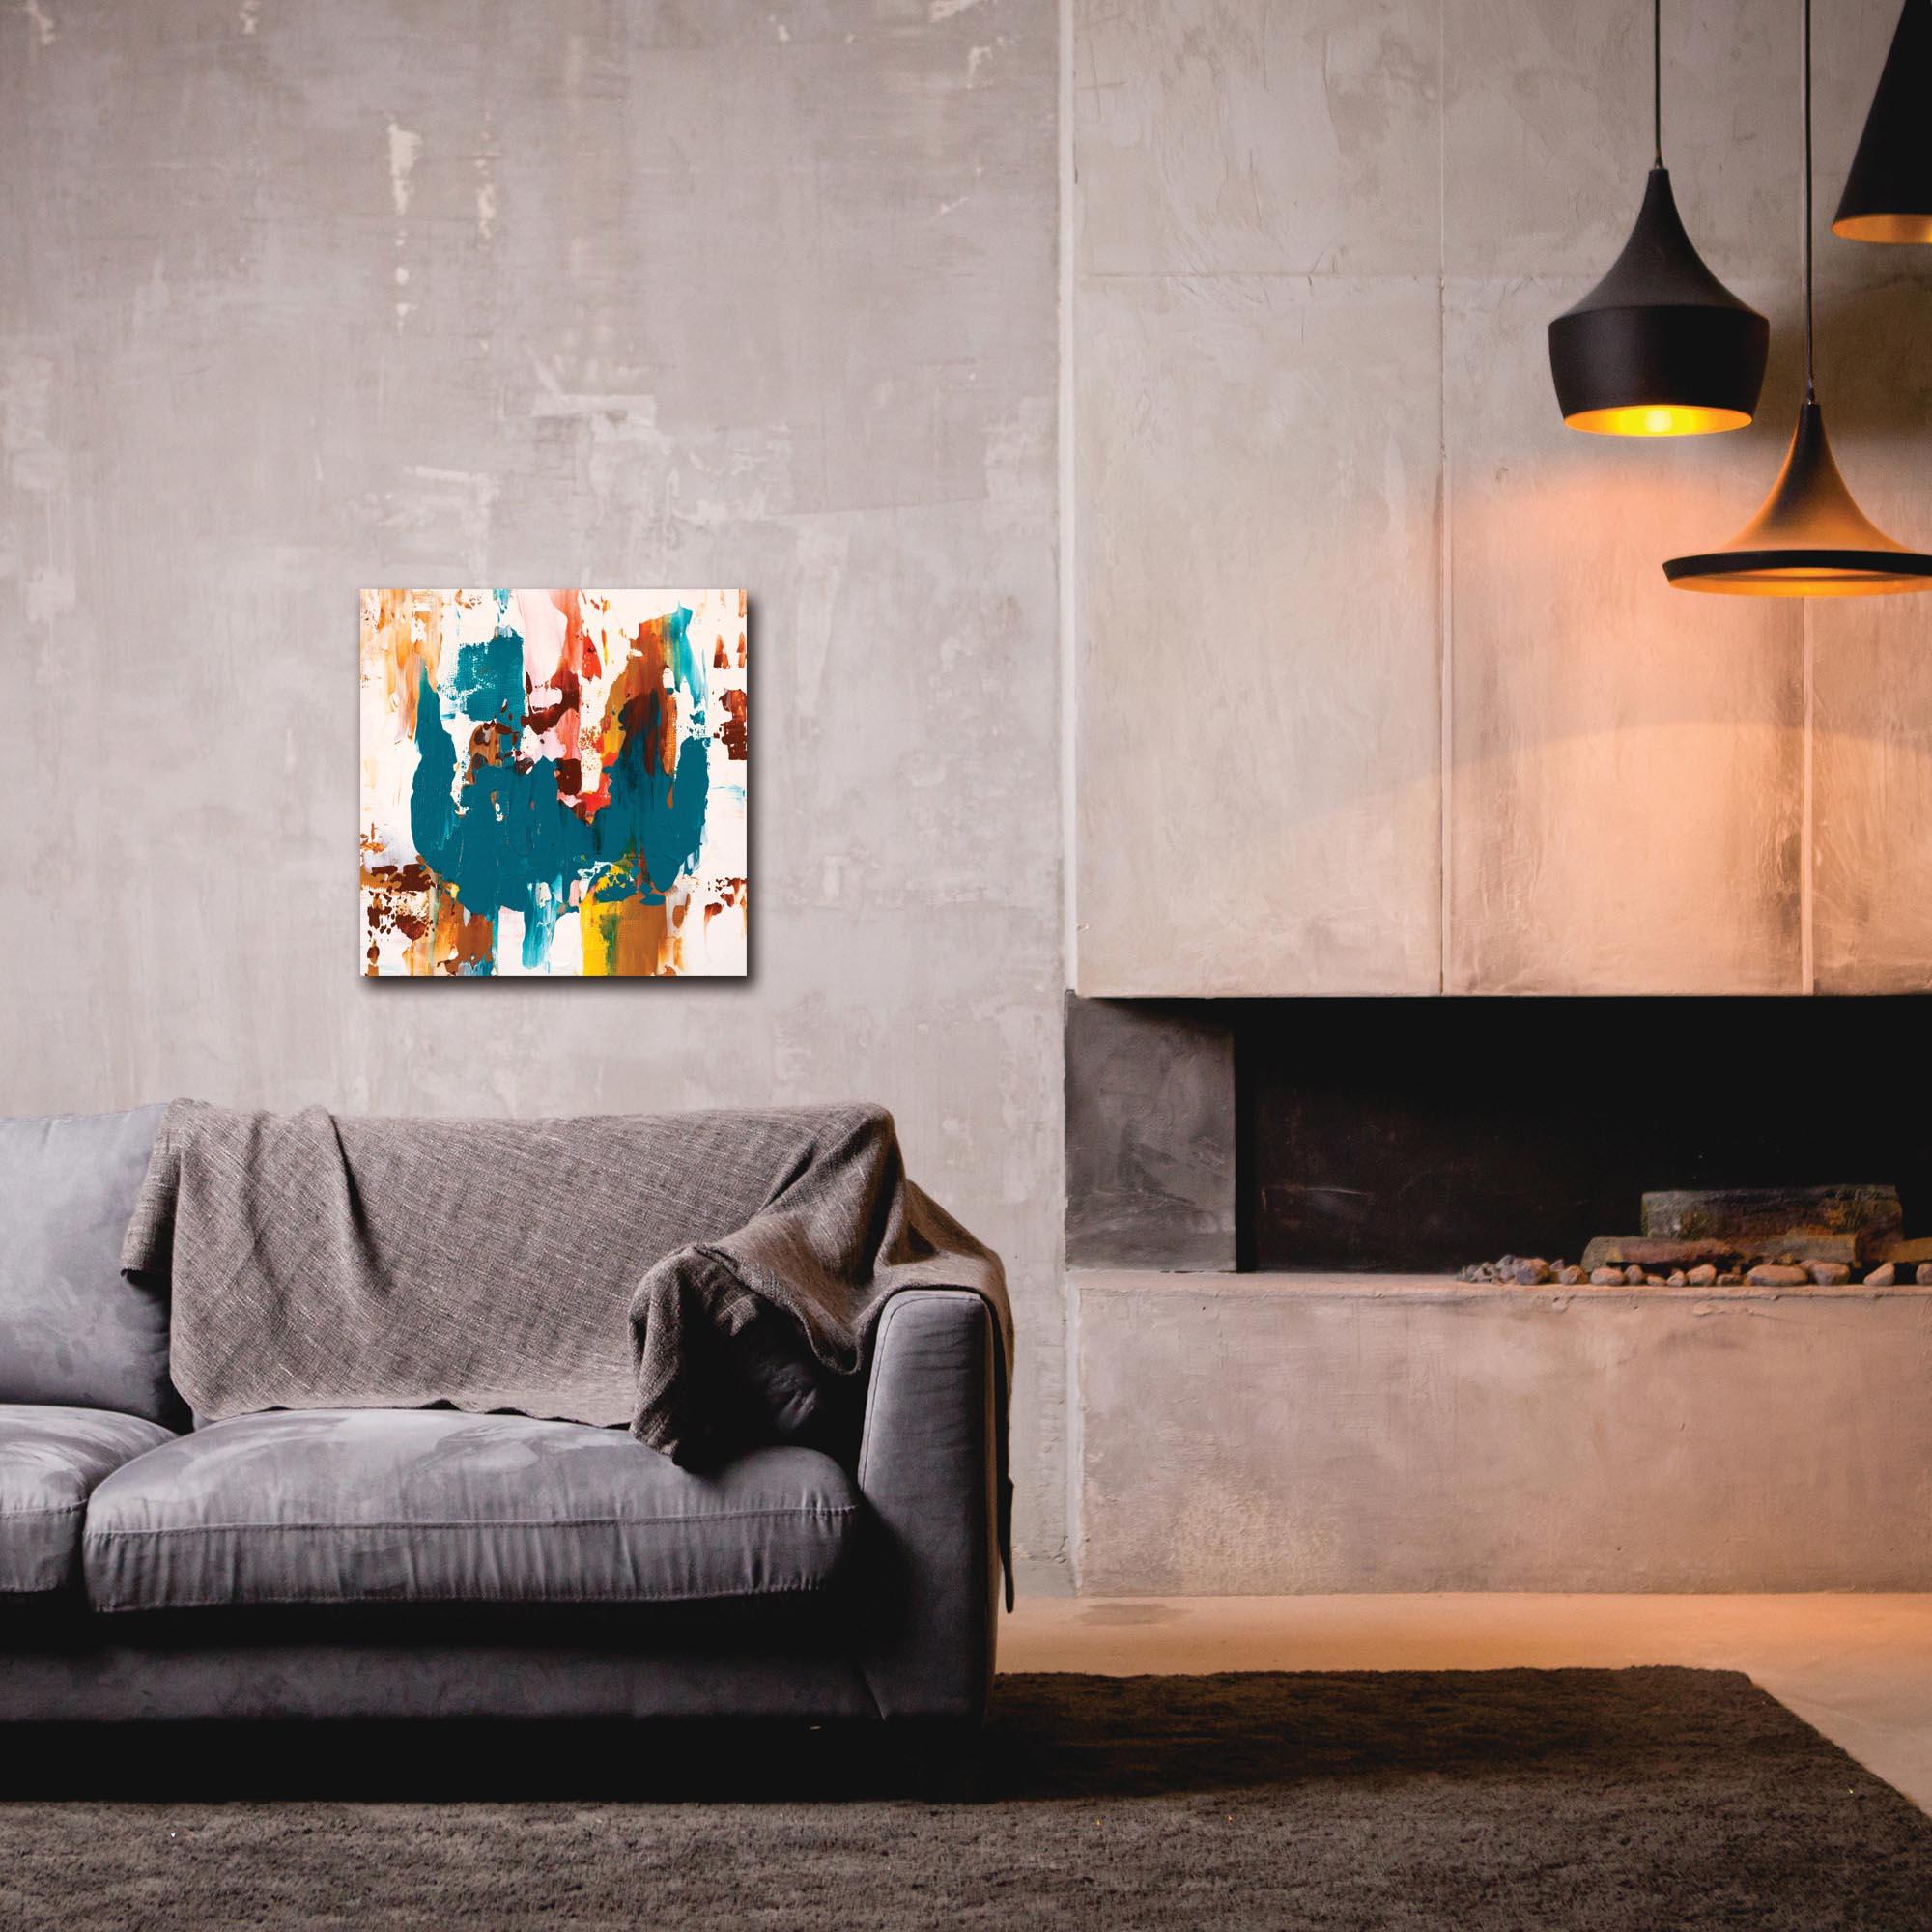 Abstract Wall Art 'Urban Life 8' - Urban Decor on Metal or Plexiglass - Lifestyle View